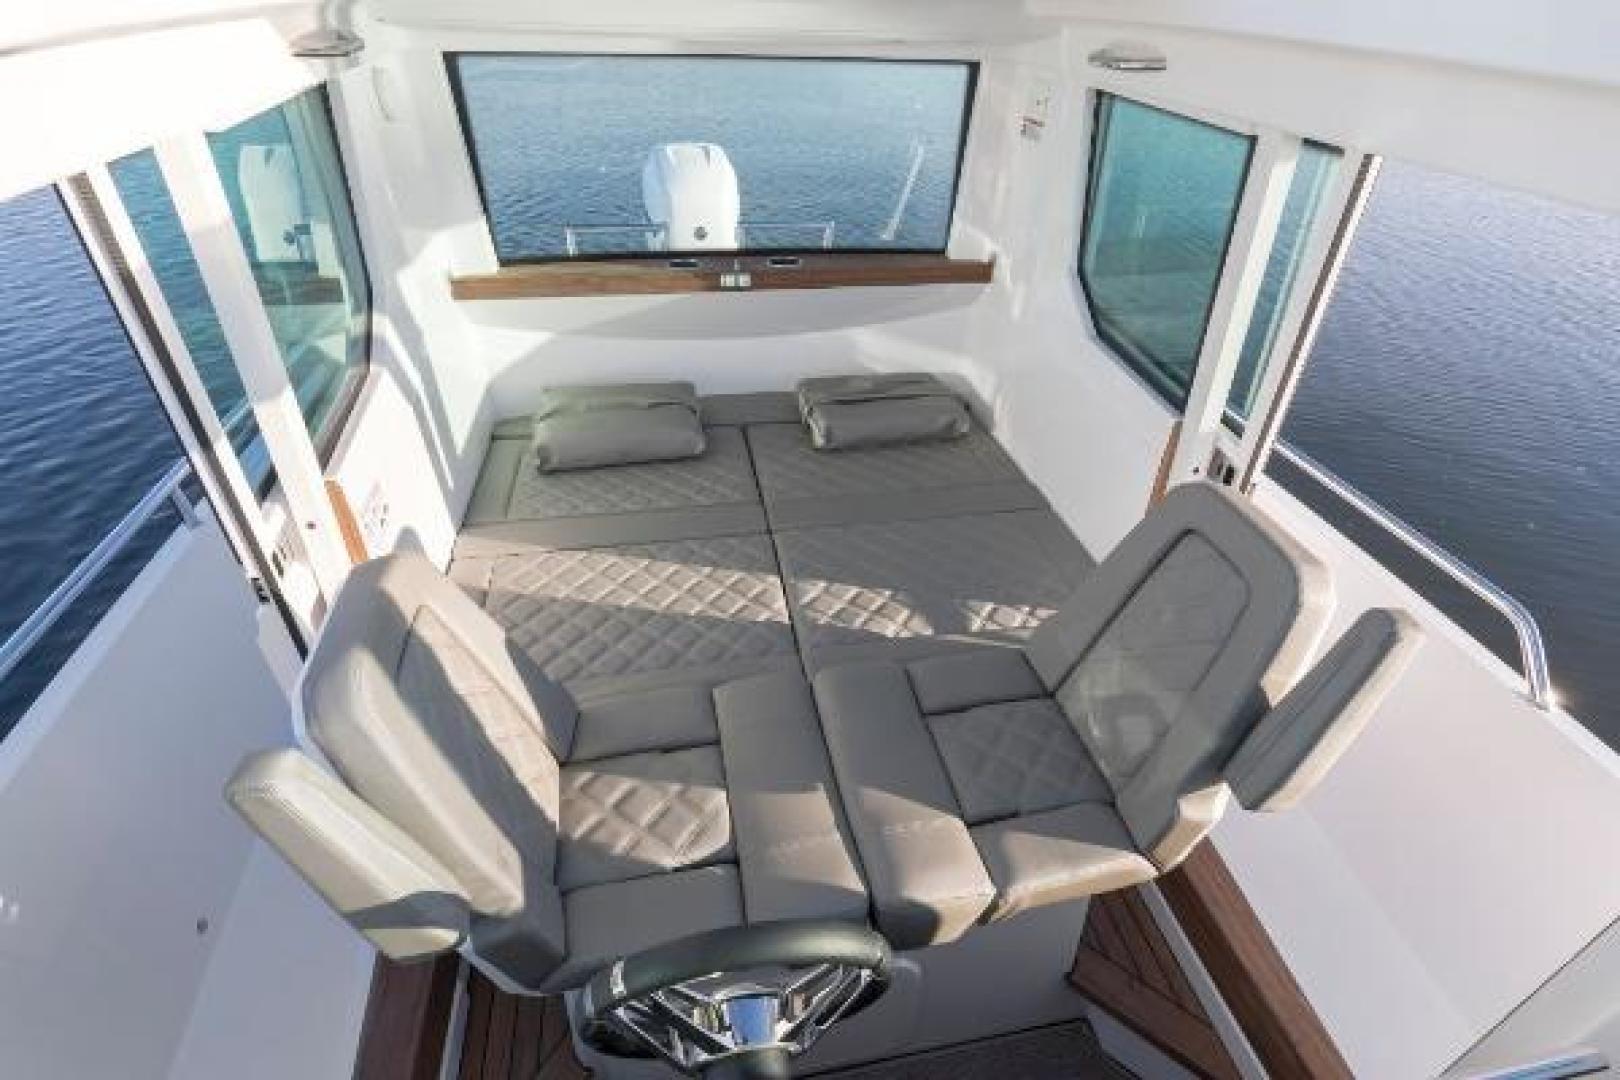 Axopar-28 CABIN 2021-Axopar 28 CABIN Tampa Bay-Florida-United States-1531516 | Thumbnail